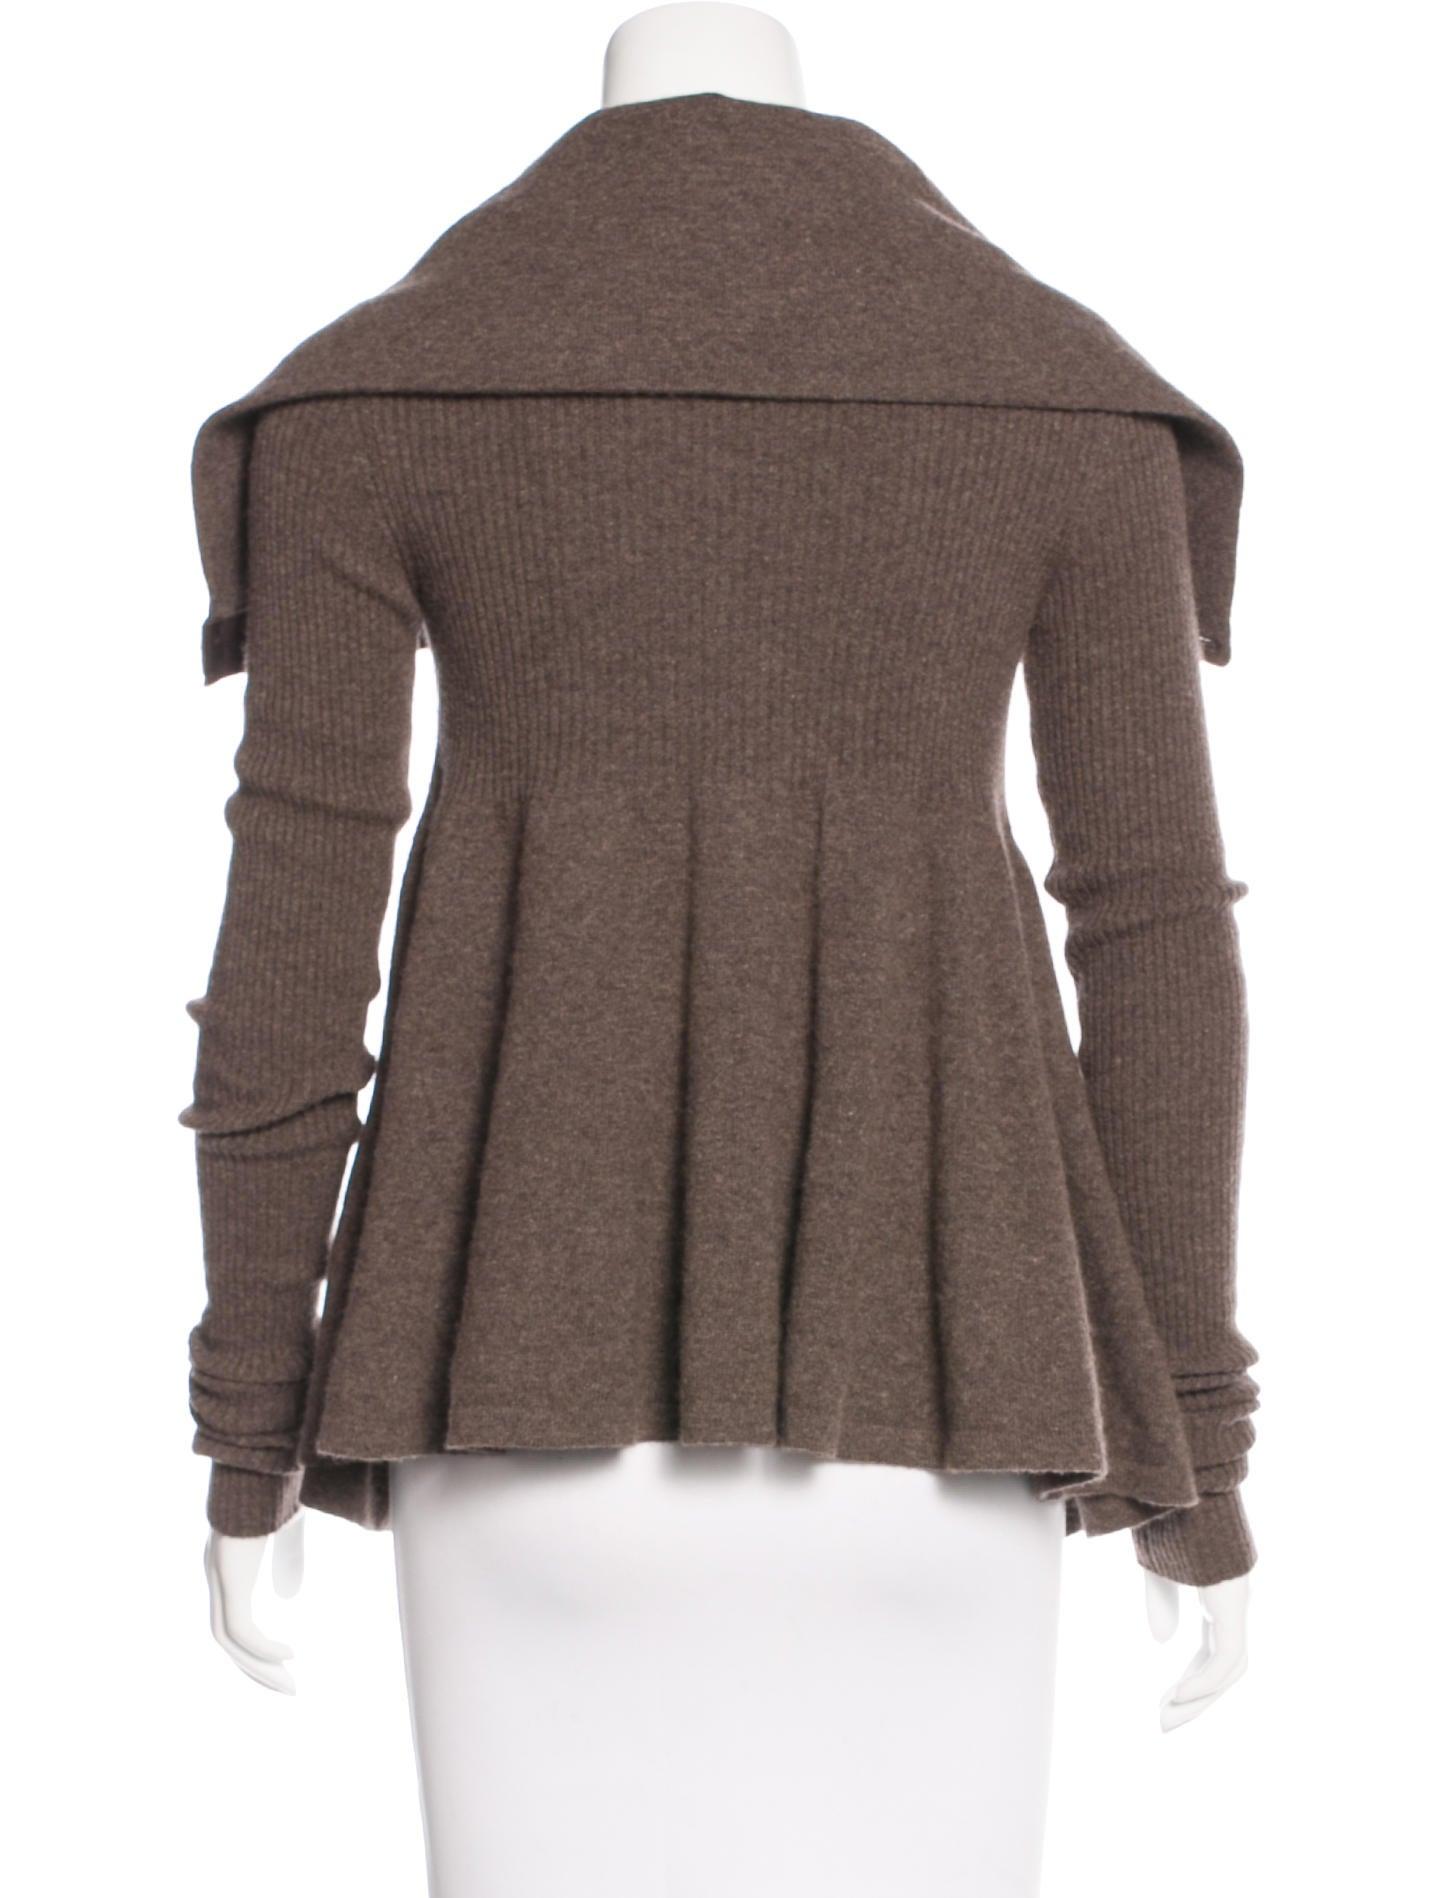 Shop online for Men's Cashmere Sweaters: Crewneck & V-Neck at erawtoir.ga Find turtlenecks & cardigans. Free Shipping. Free Returns. All the time.